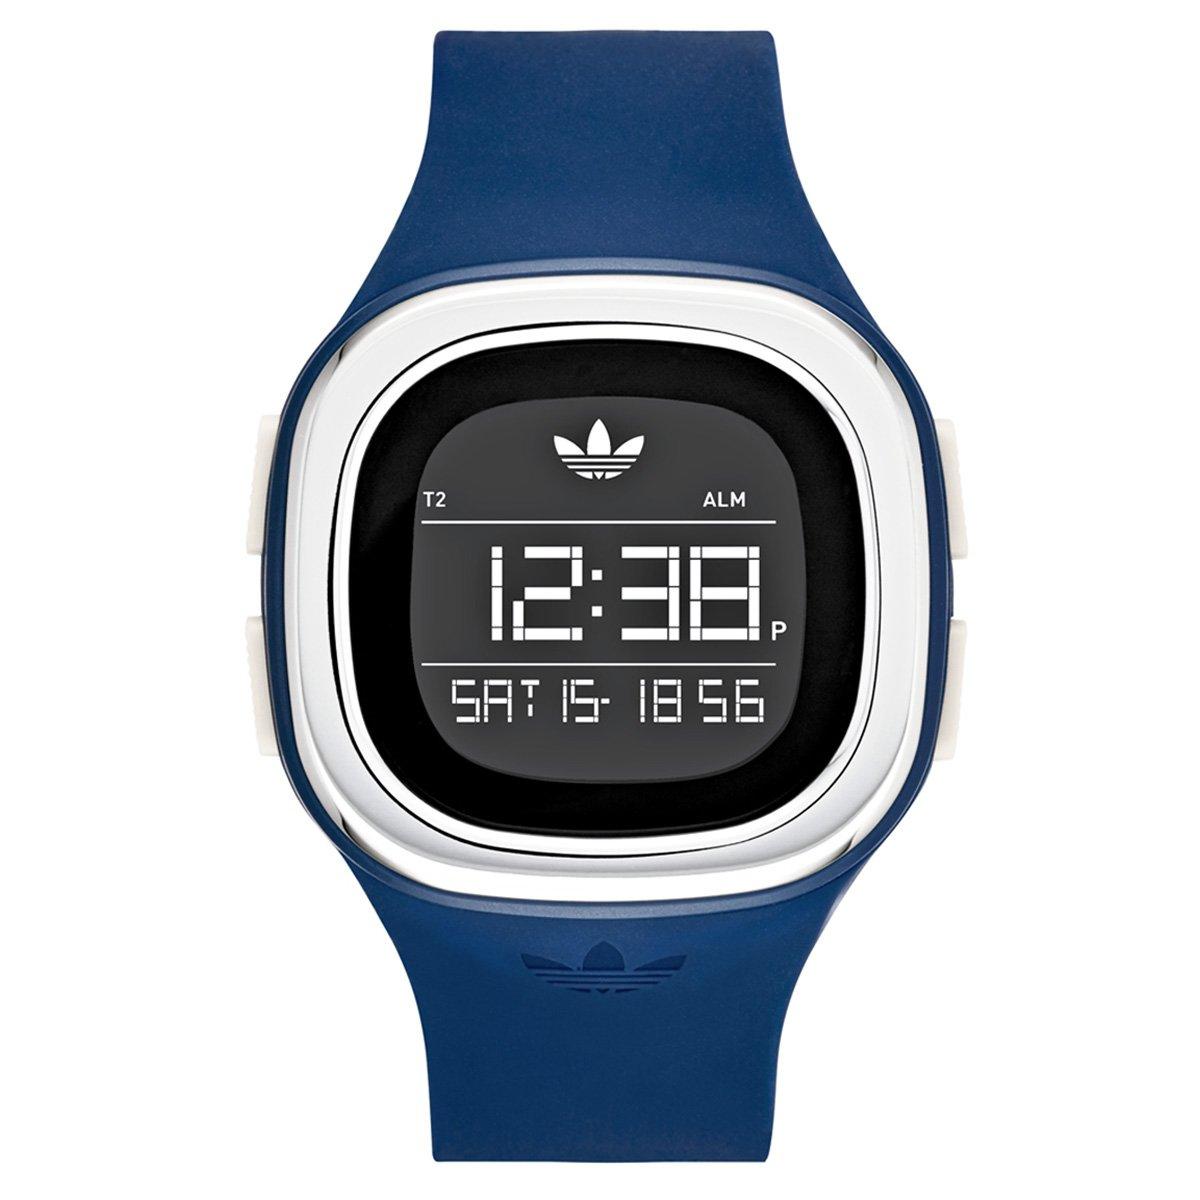 11b74377d58 Relógio Adidas ADH3139 - Compre Agora